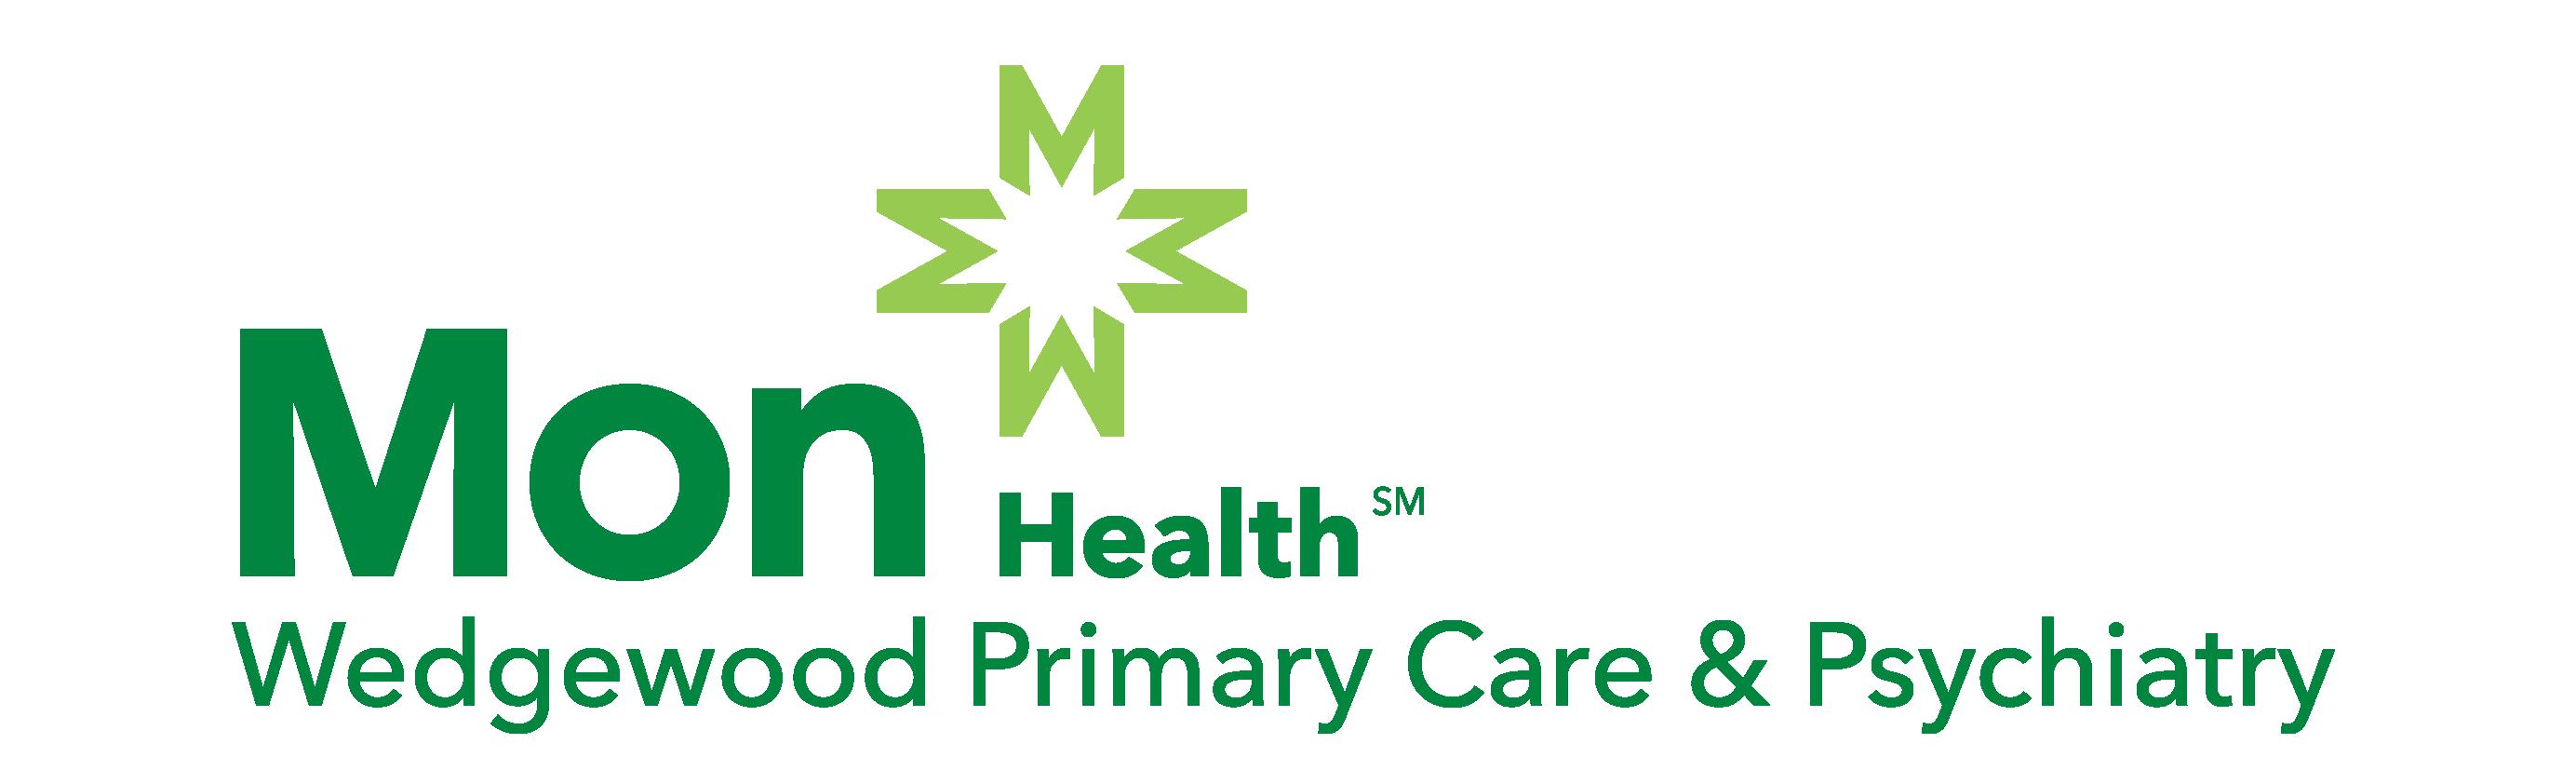 Wedgewood Logo Hubspot.png